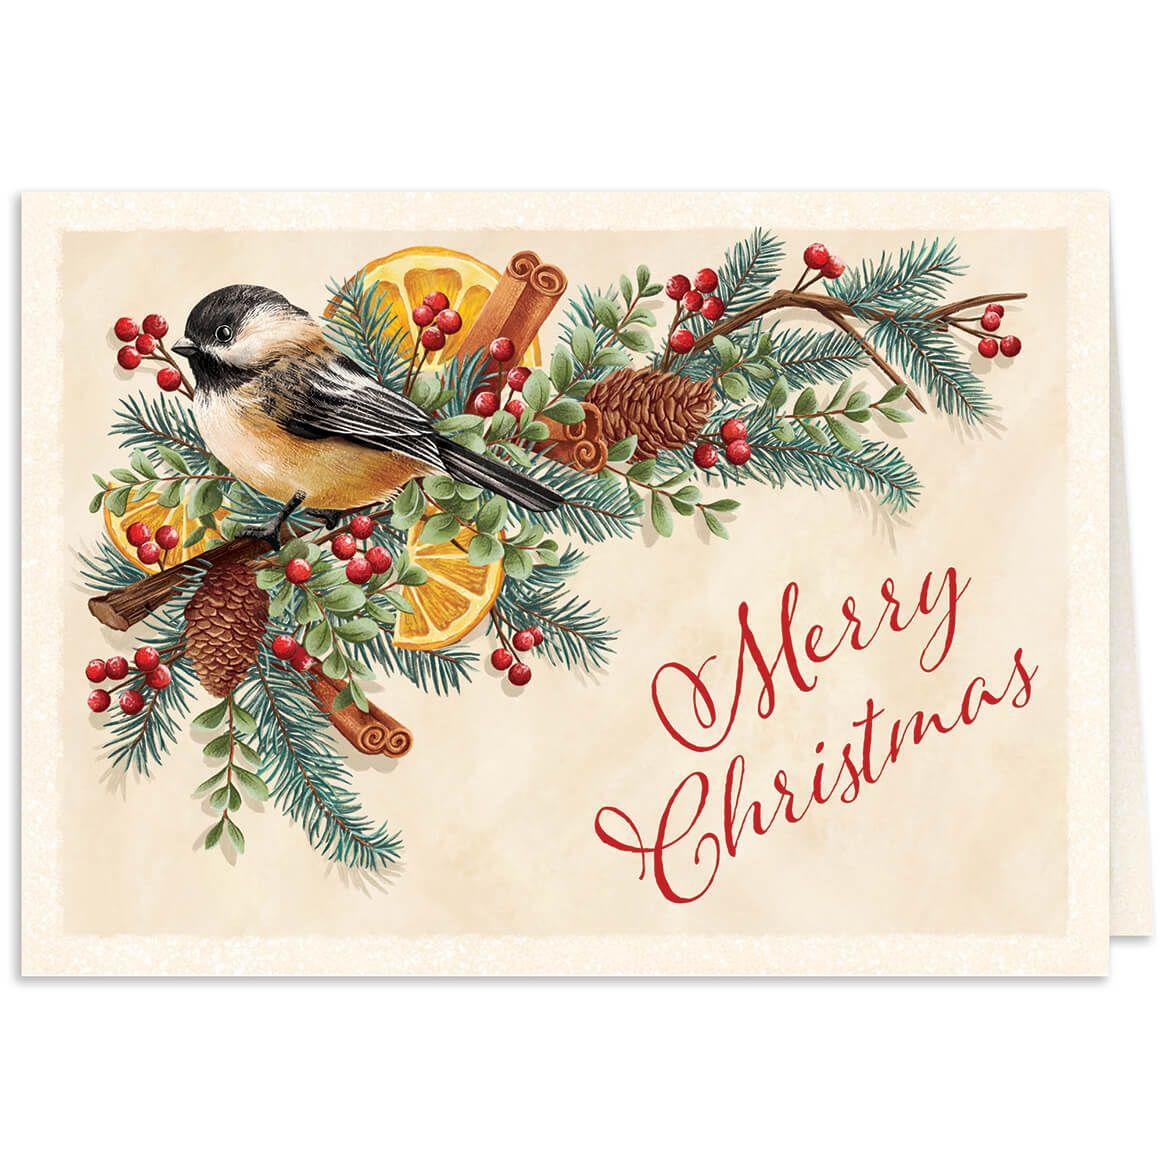 Chickadee Potpourri Christmas Card Set of 20-368215